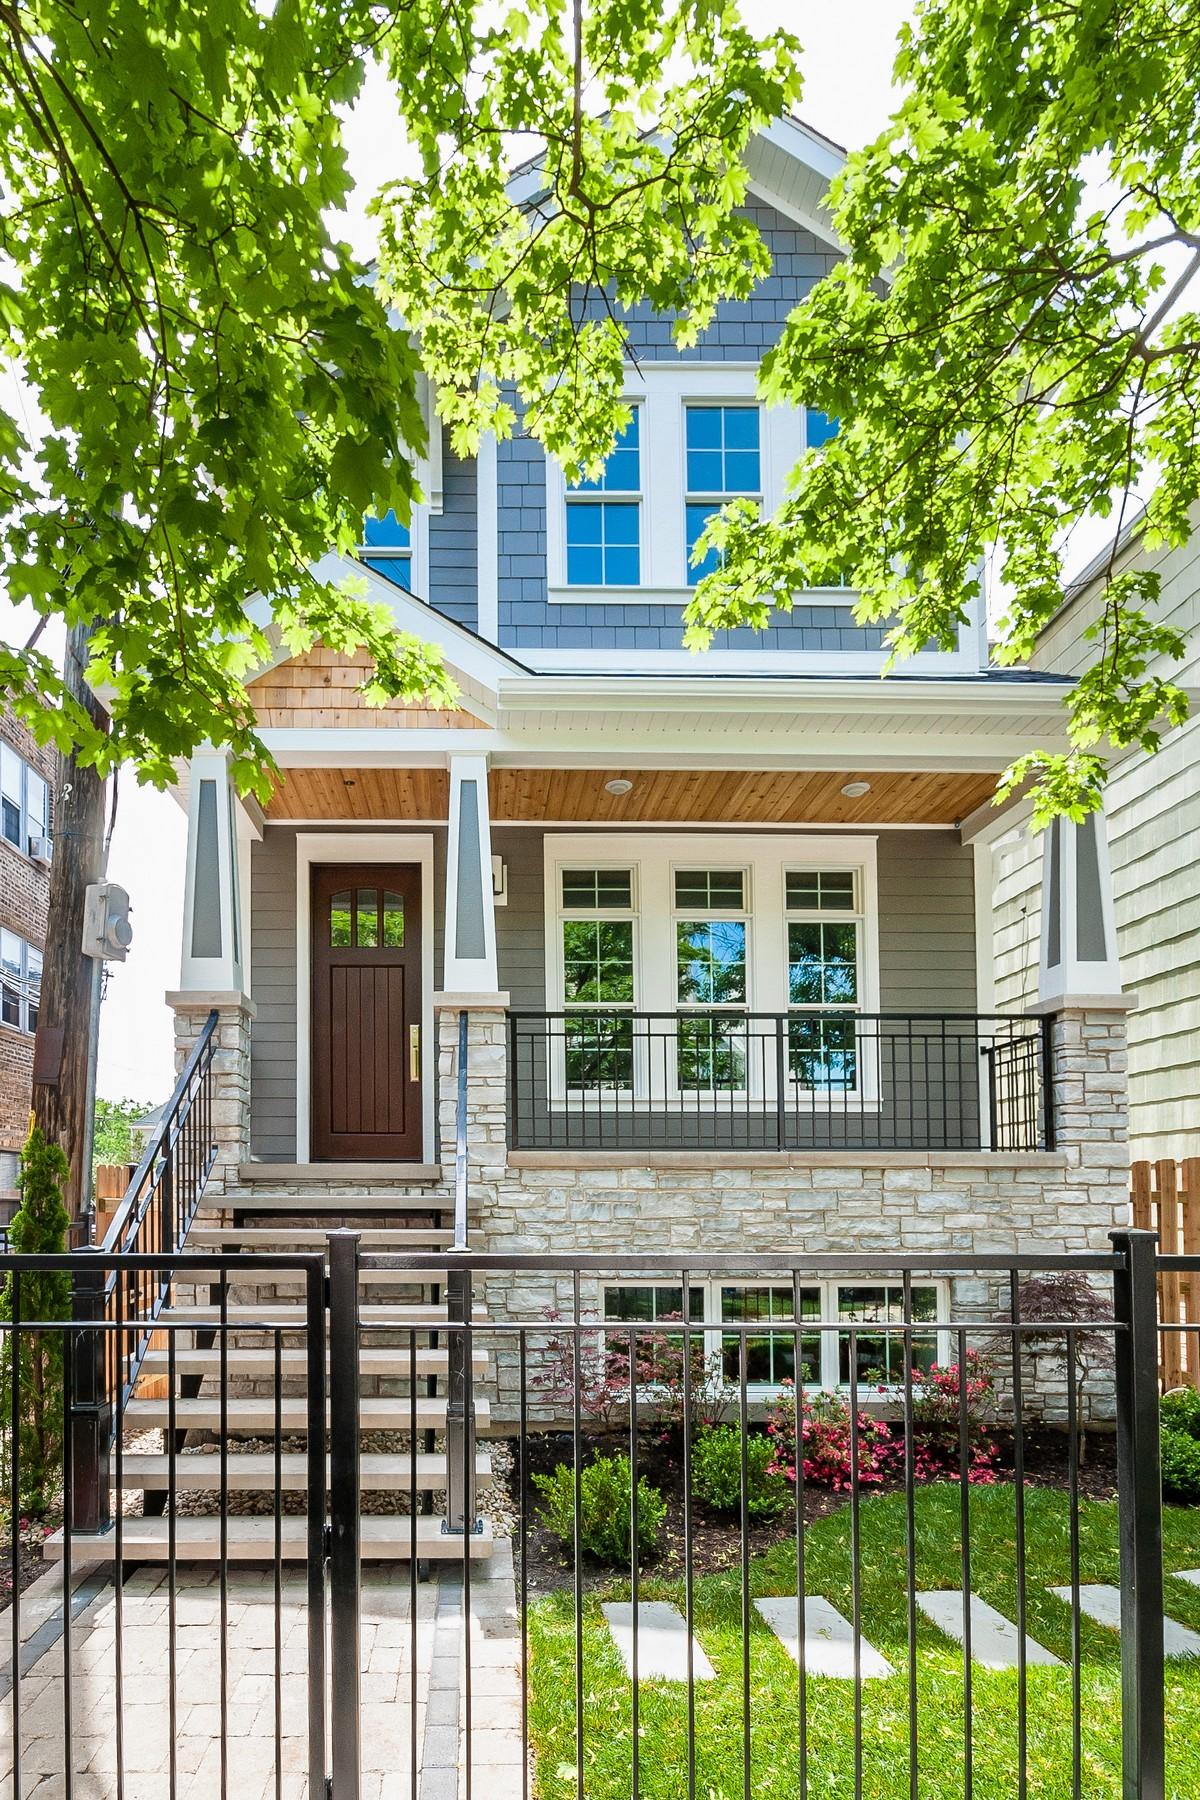 獨棟家庭住宅 為 出售 在 Micor Custom Home 2045 W Belle Plaine Avenue North Center, Chicago, 伊利諾斯州, 60618 美國